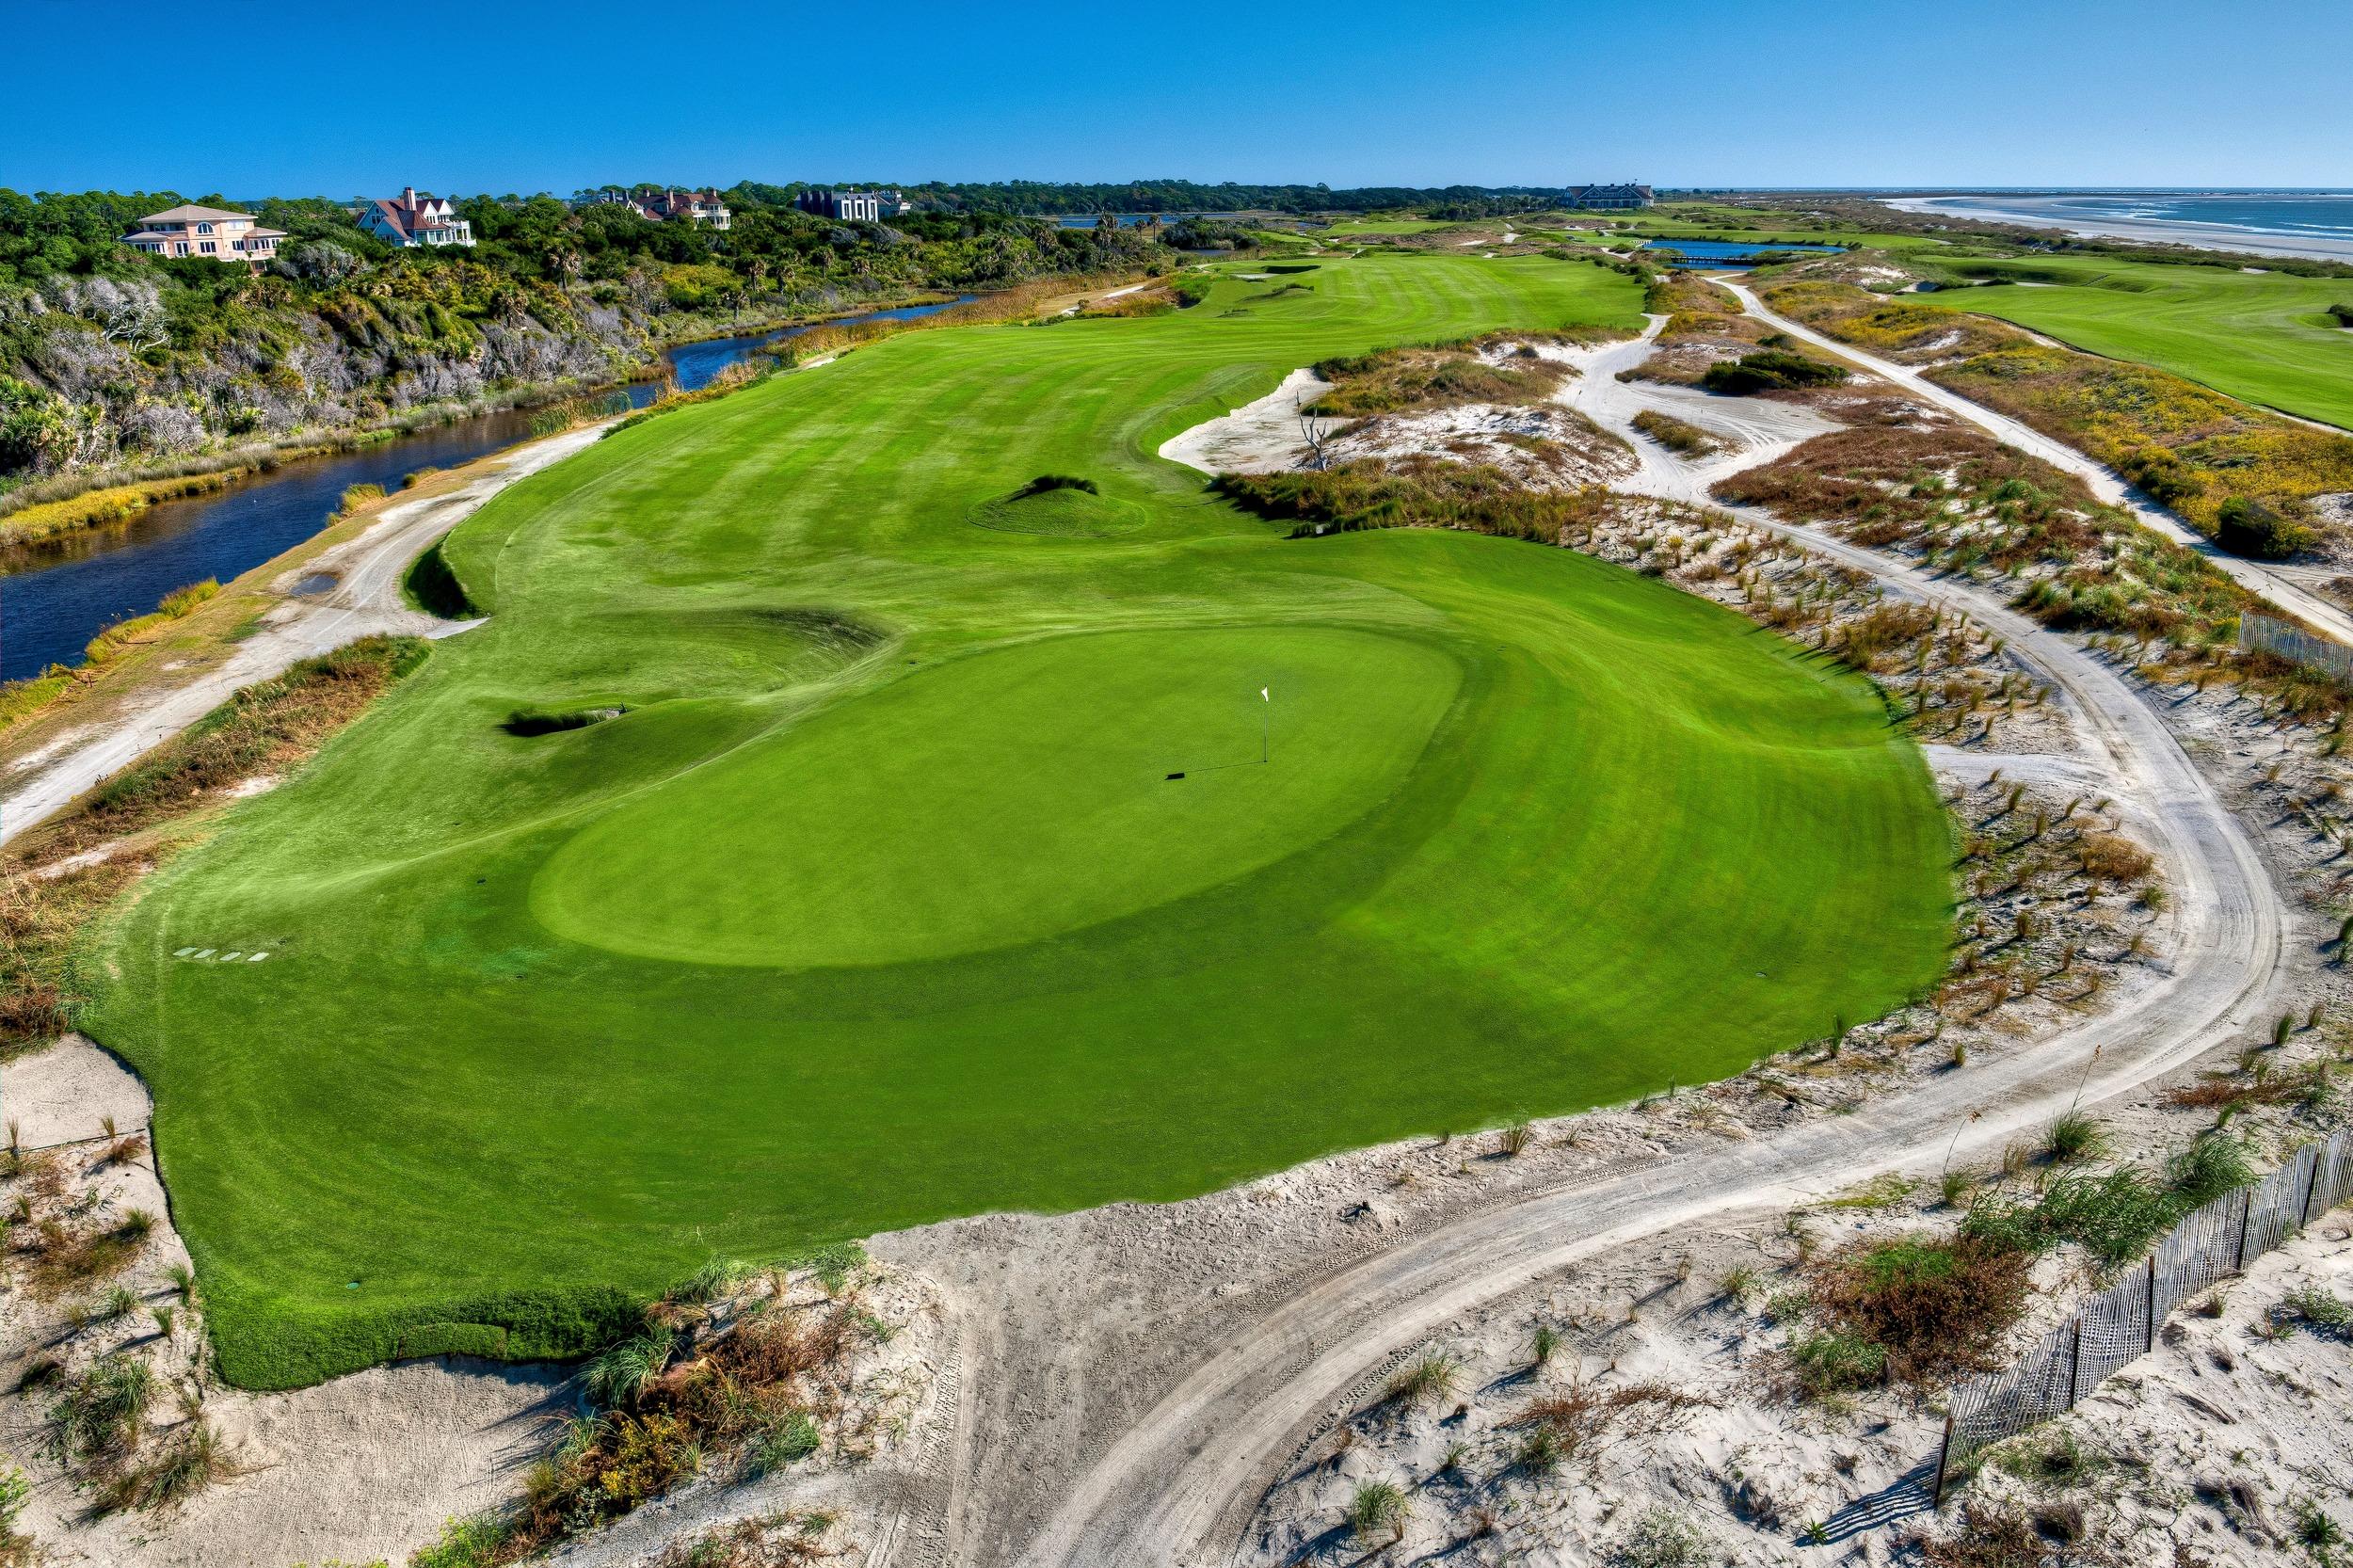 8/Championship golf